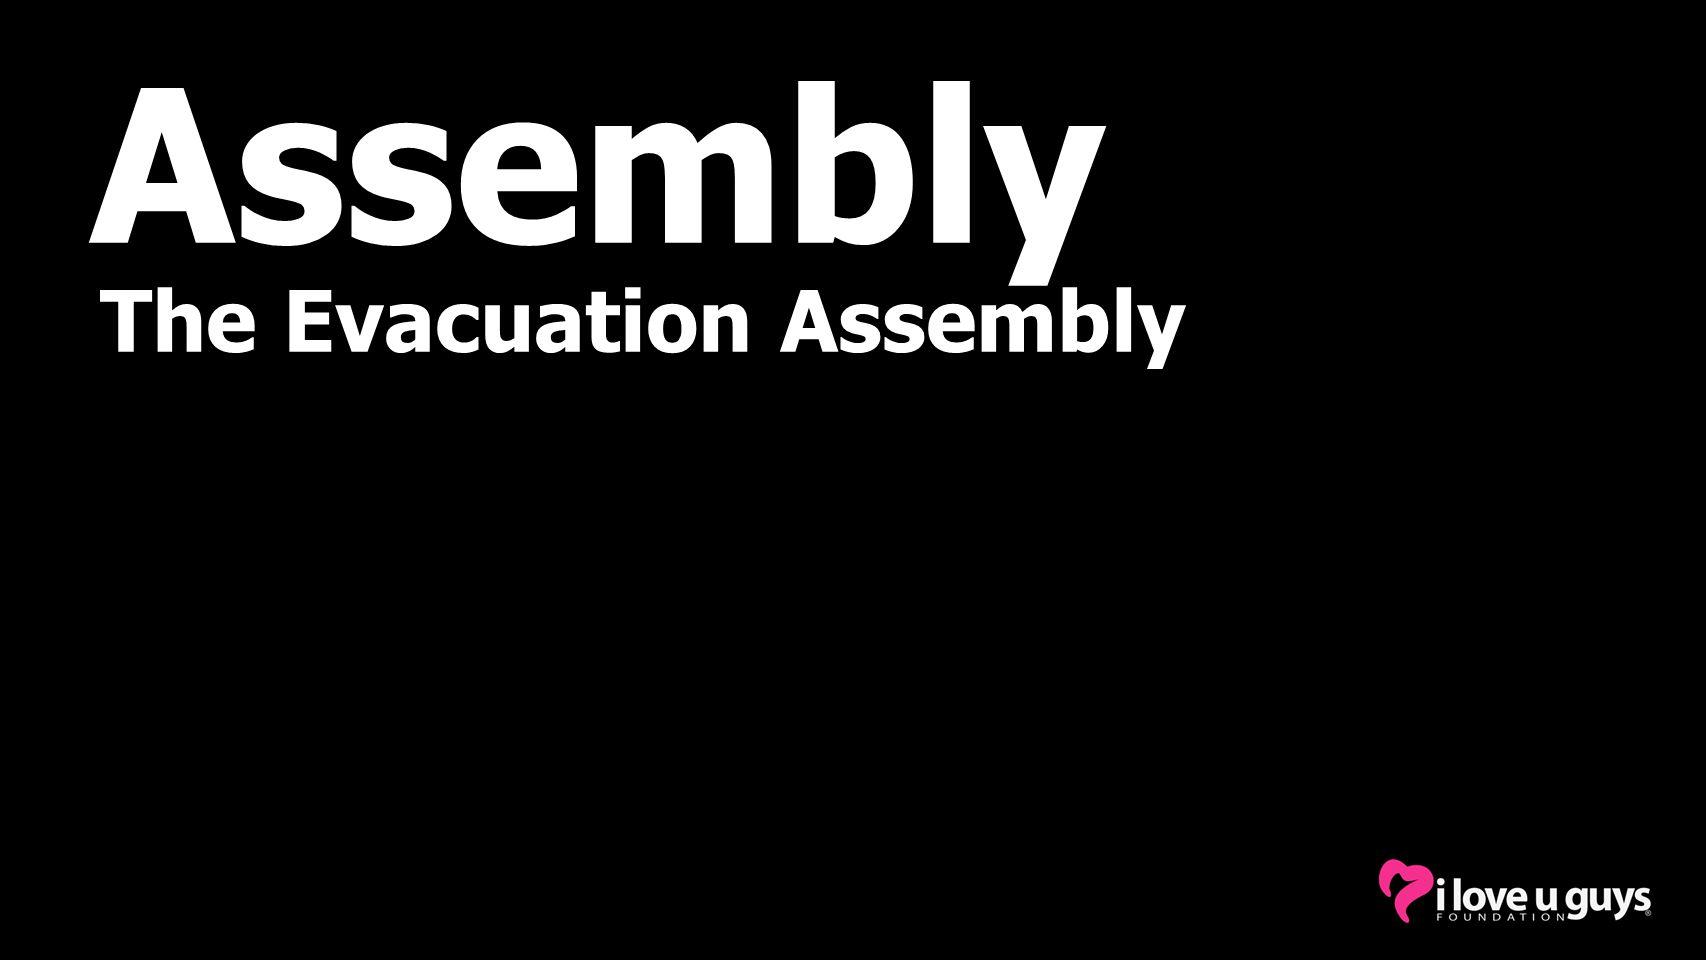 The Evacuation Assembly Assembly